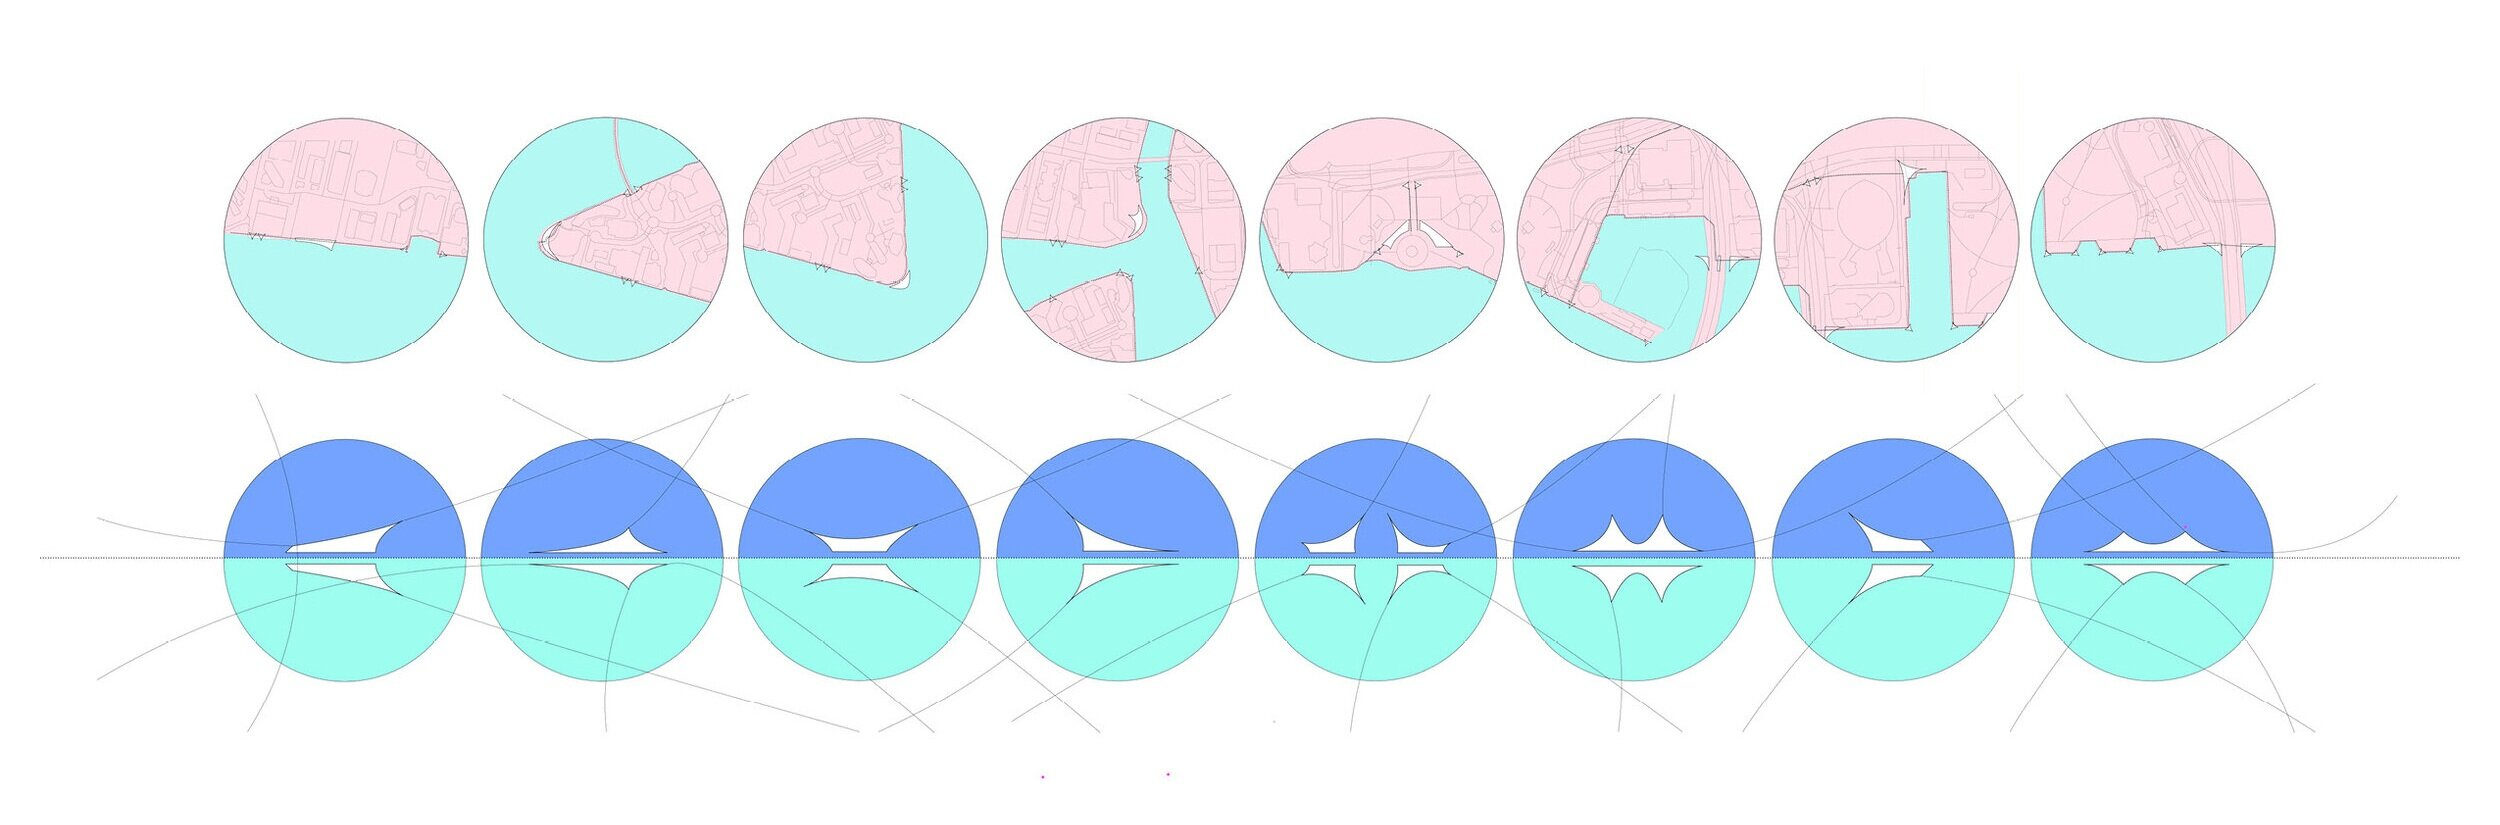 170720 Miami RFP Storyboard Diagrams3.jpg